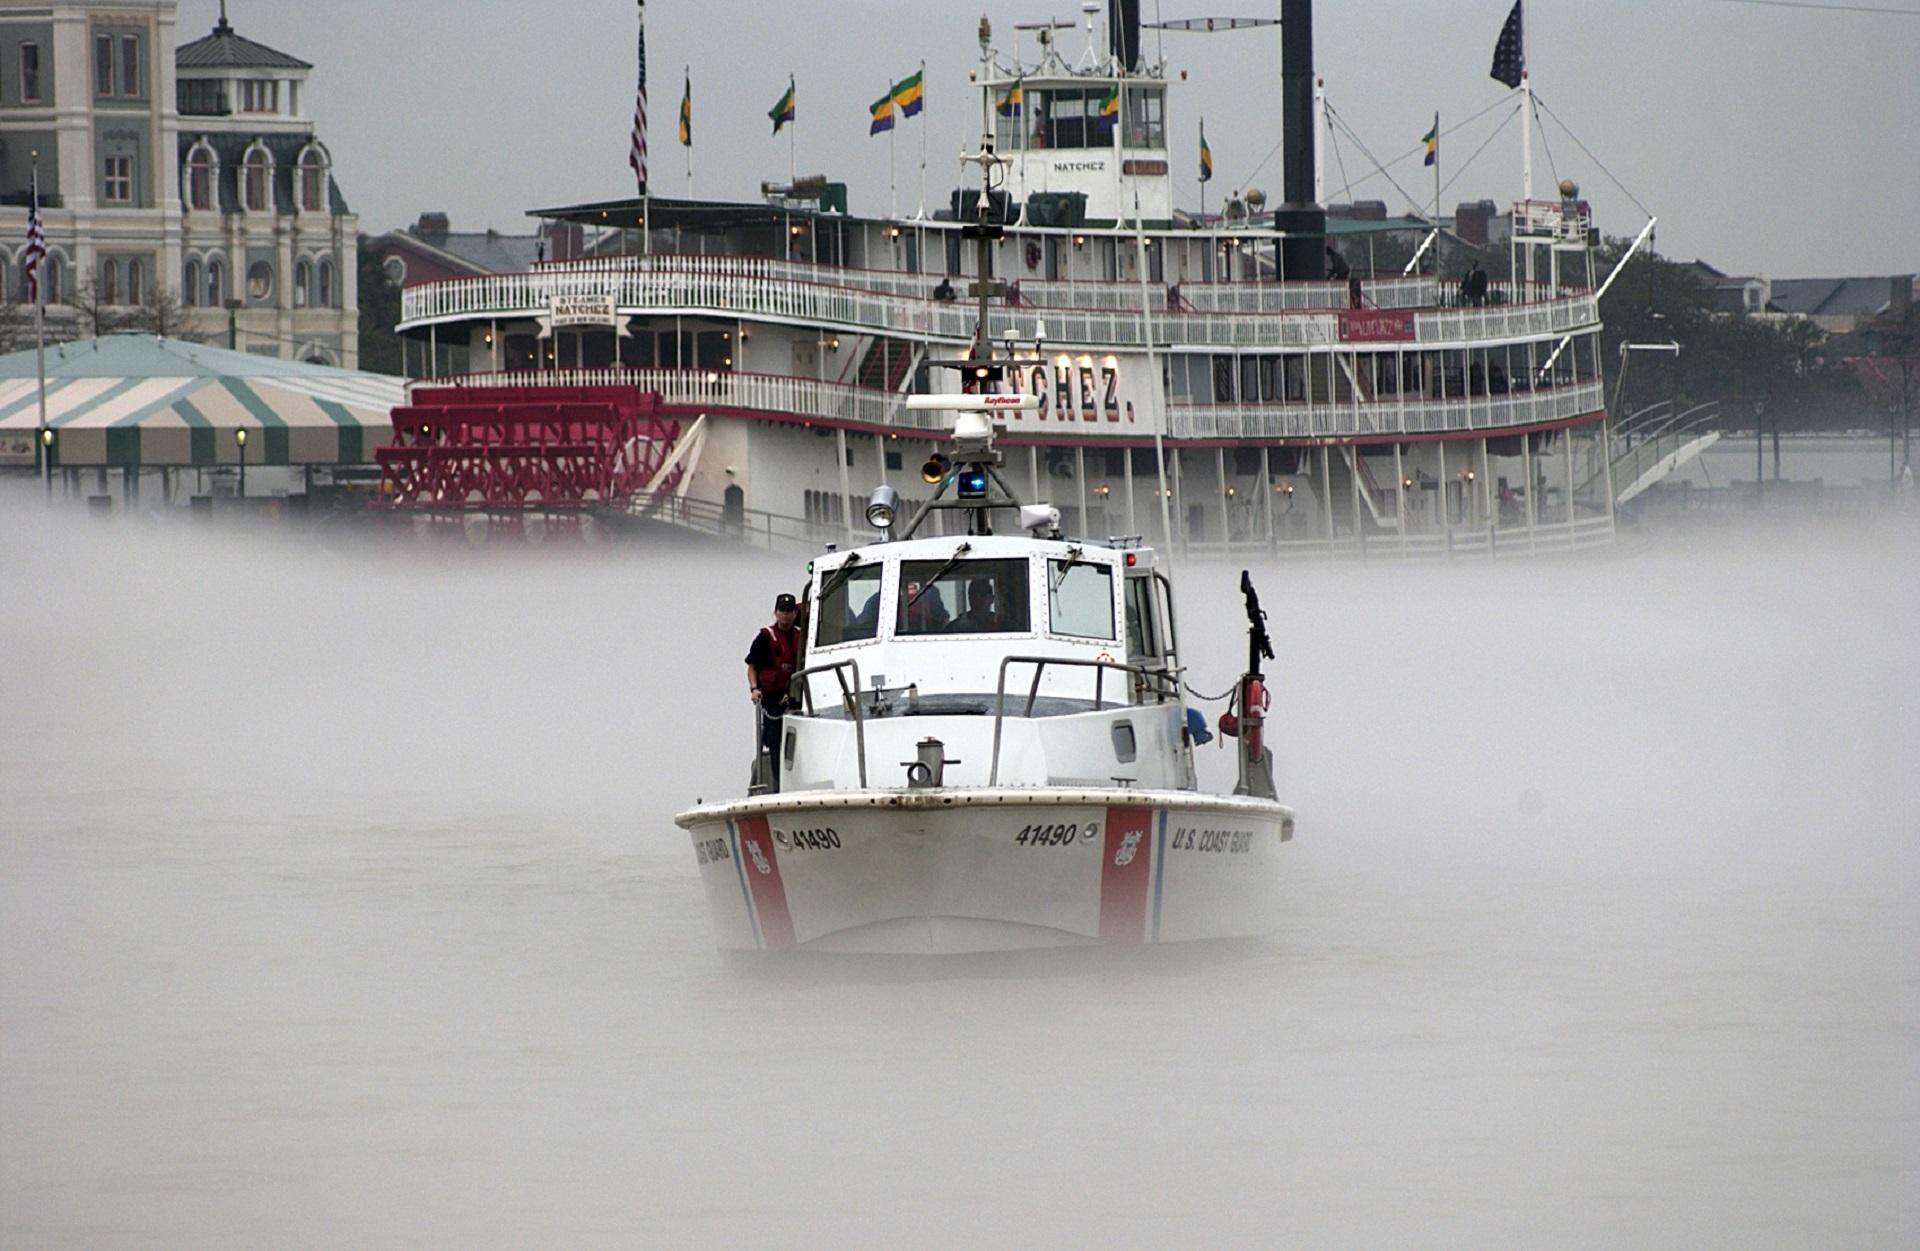 Coast guard patrol boat photo